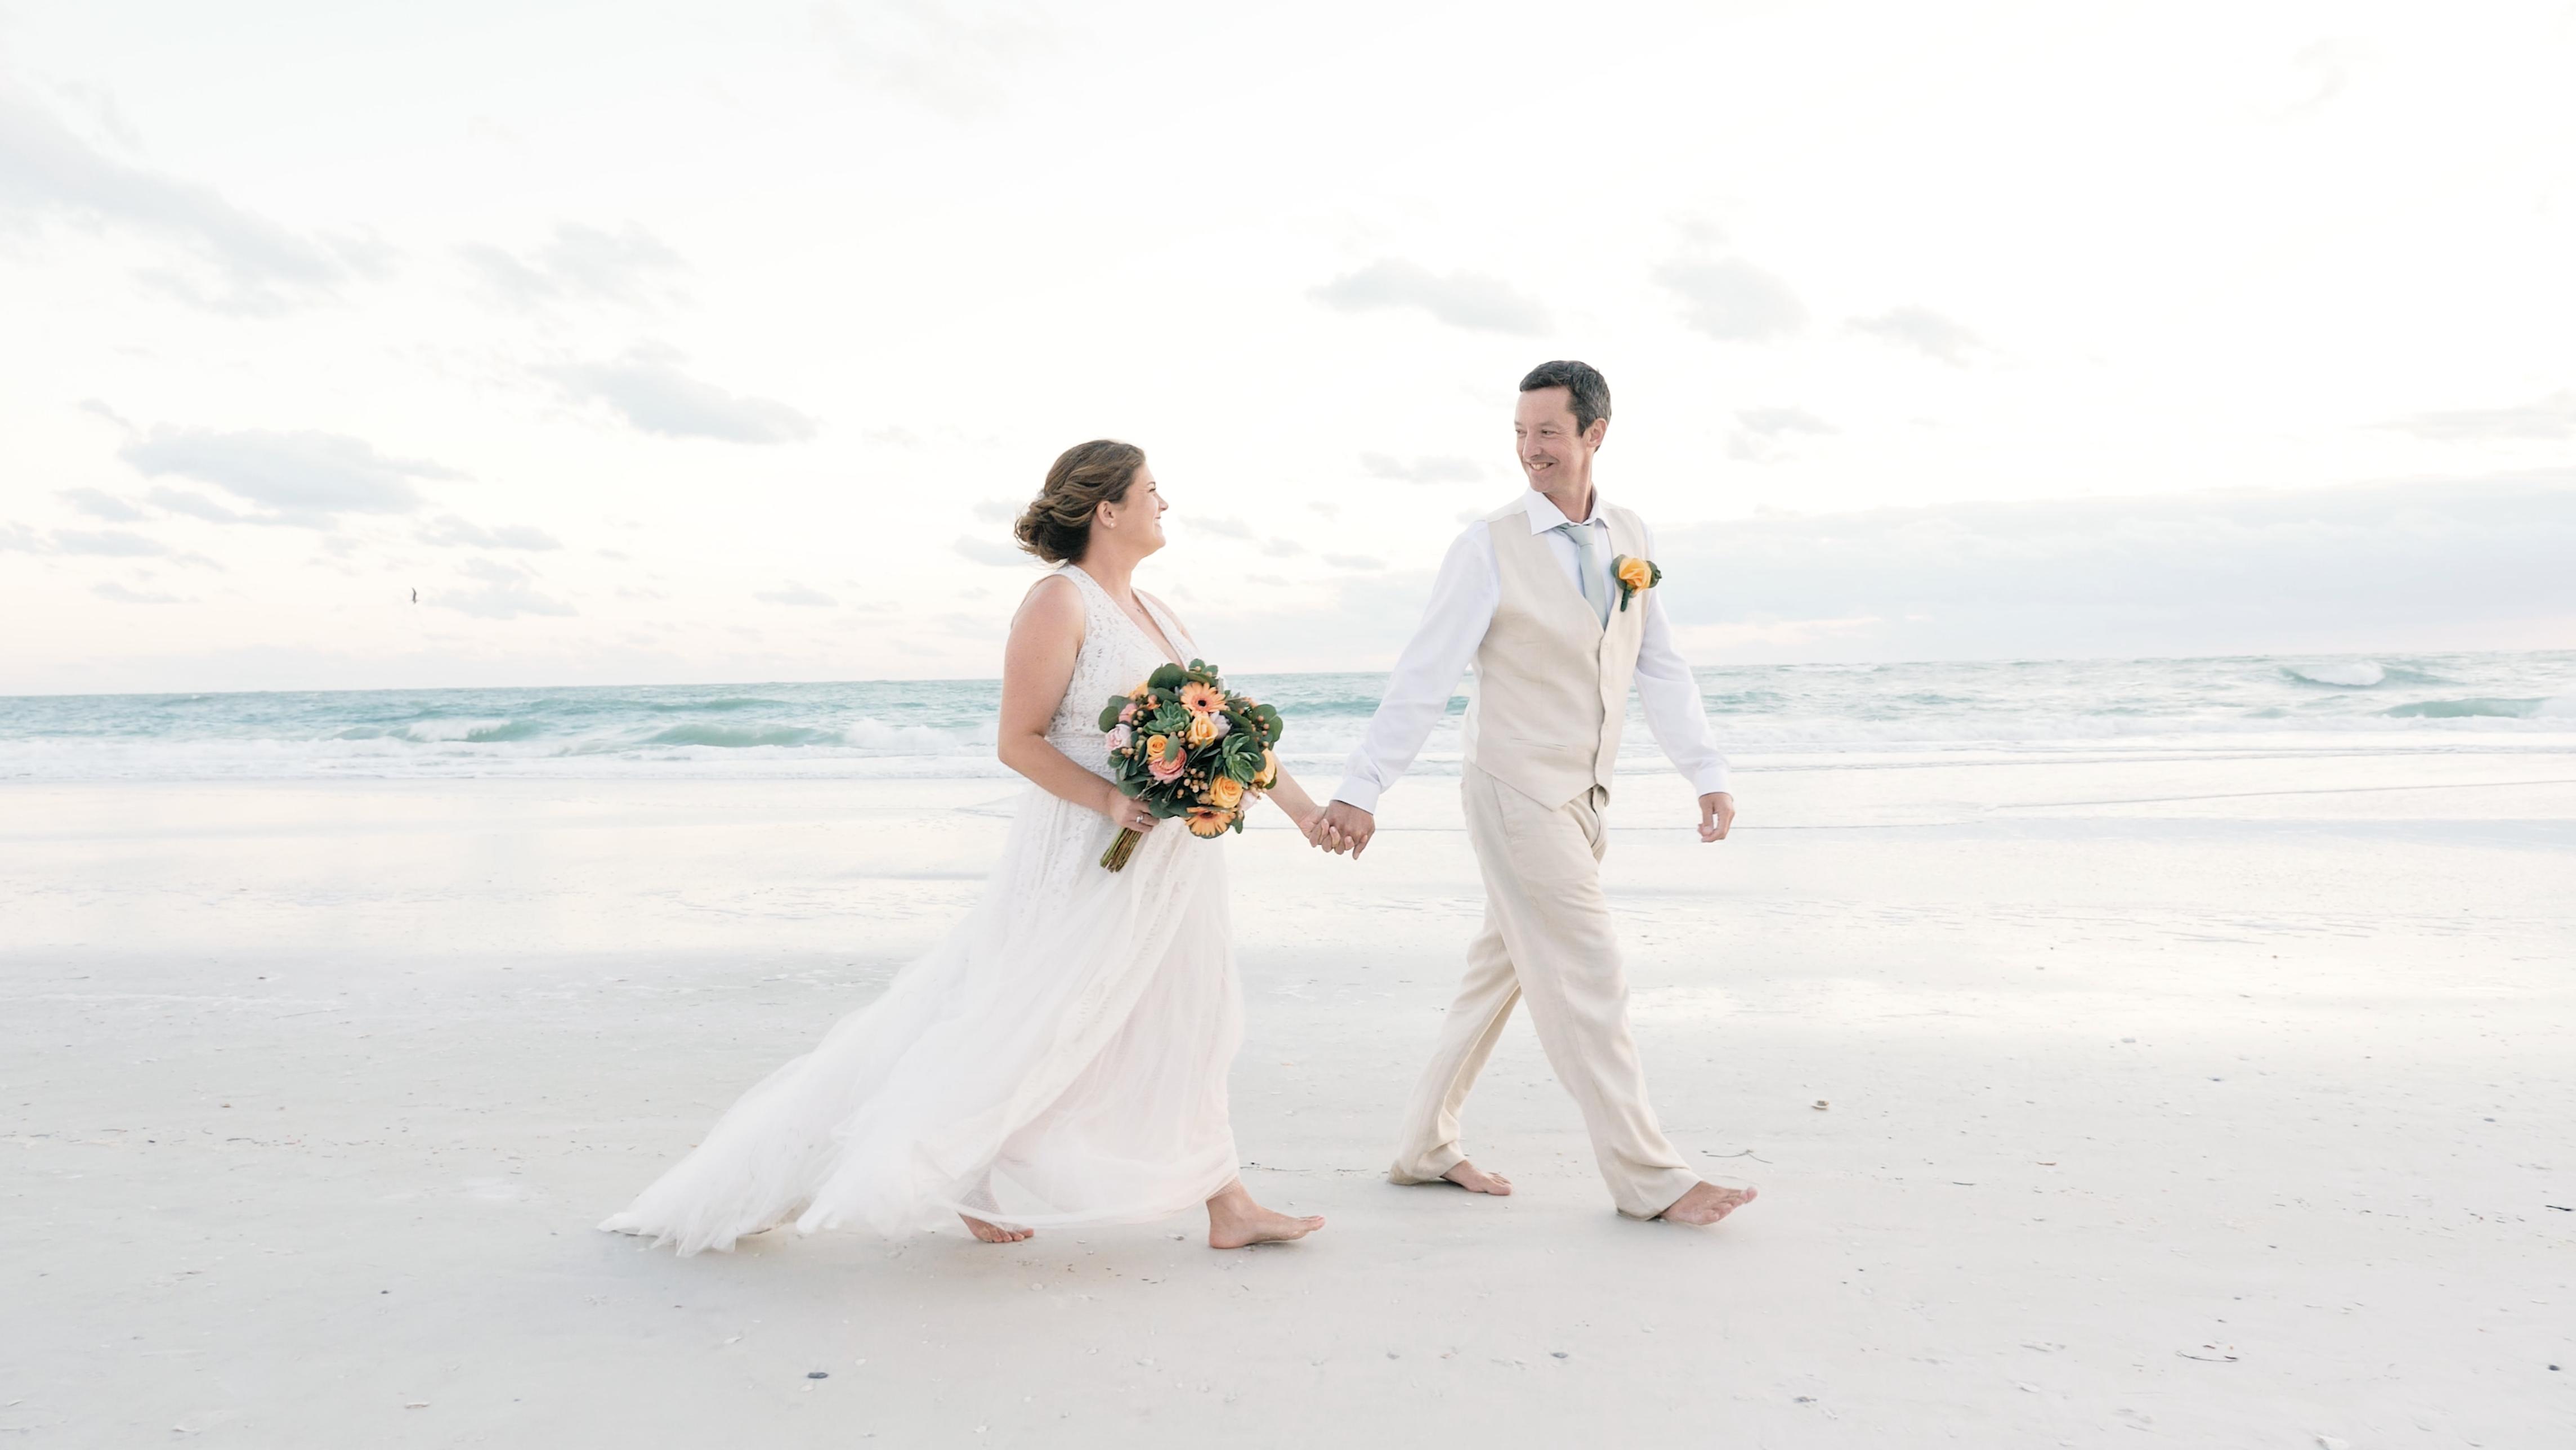 Margaret + Darren | Anna Maria, Florida | The Sandbar Restaurant